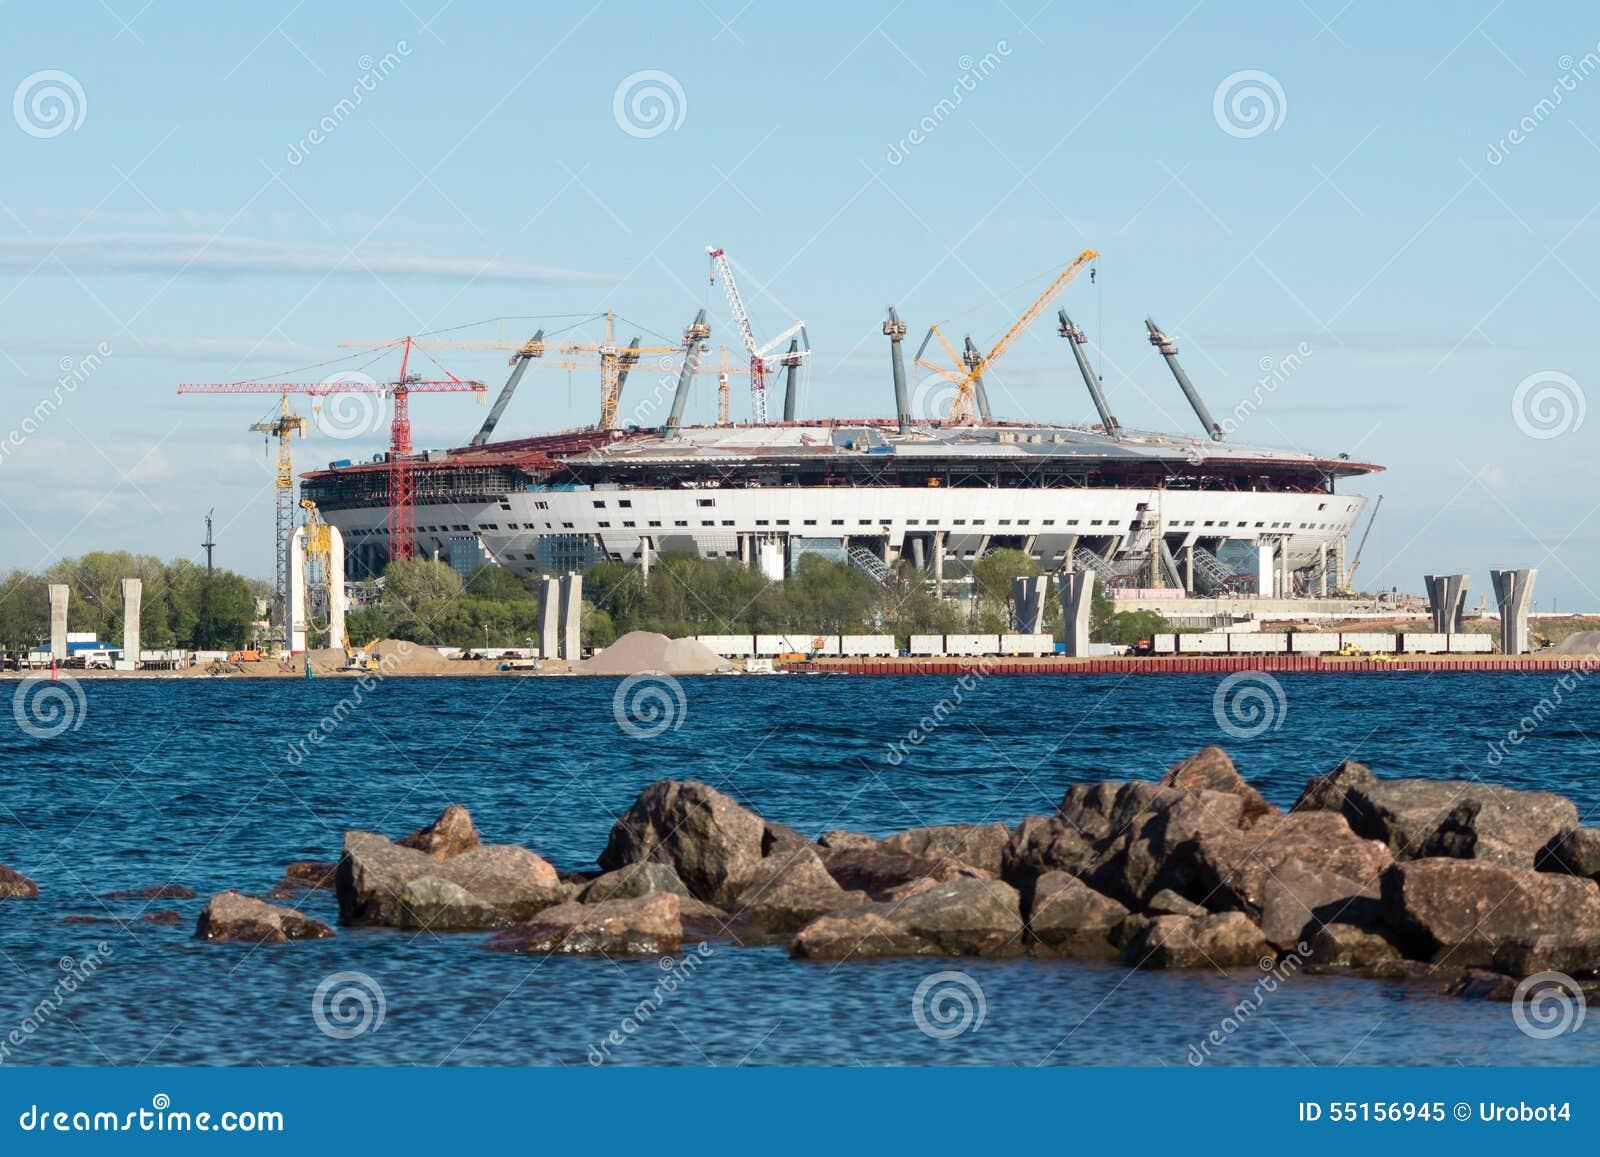 Neva Bay, St. Petersburg: description 25